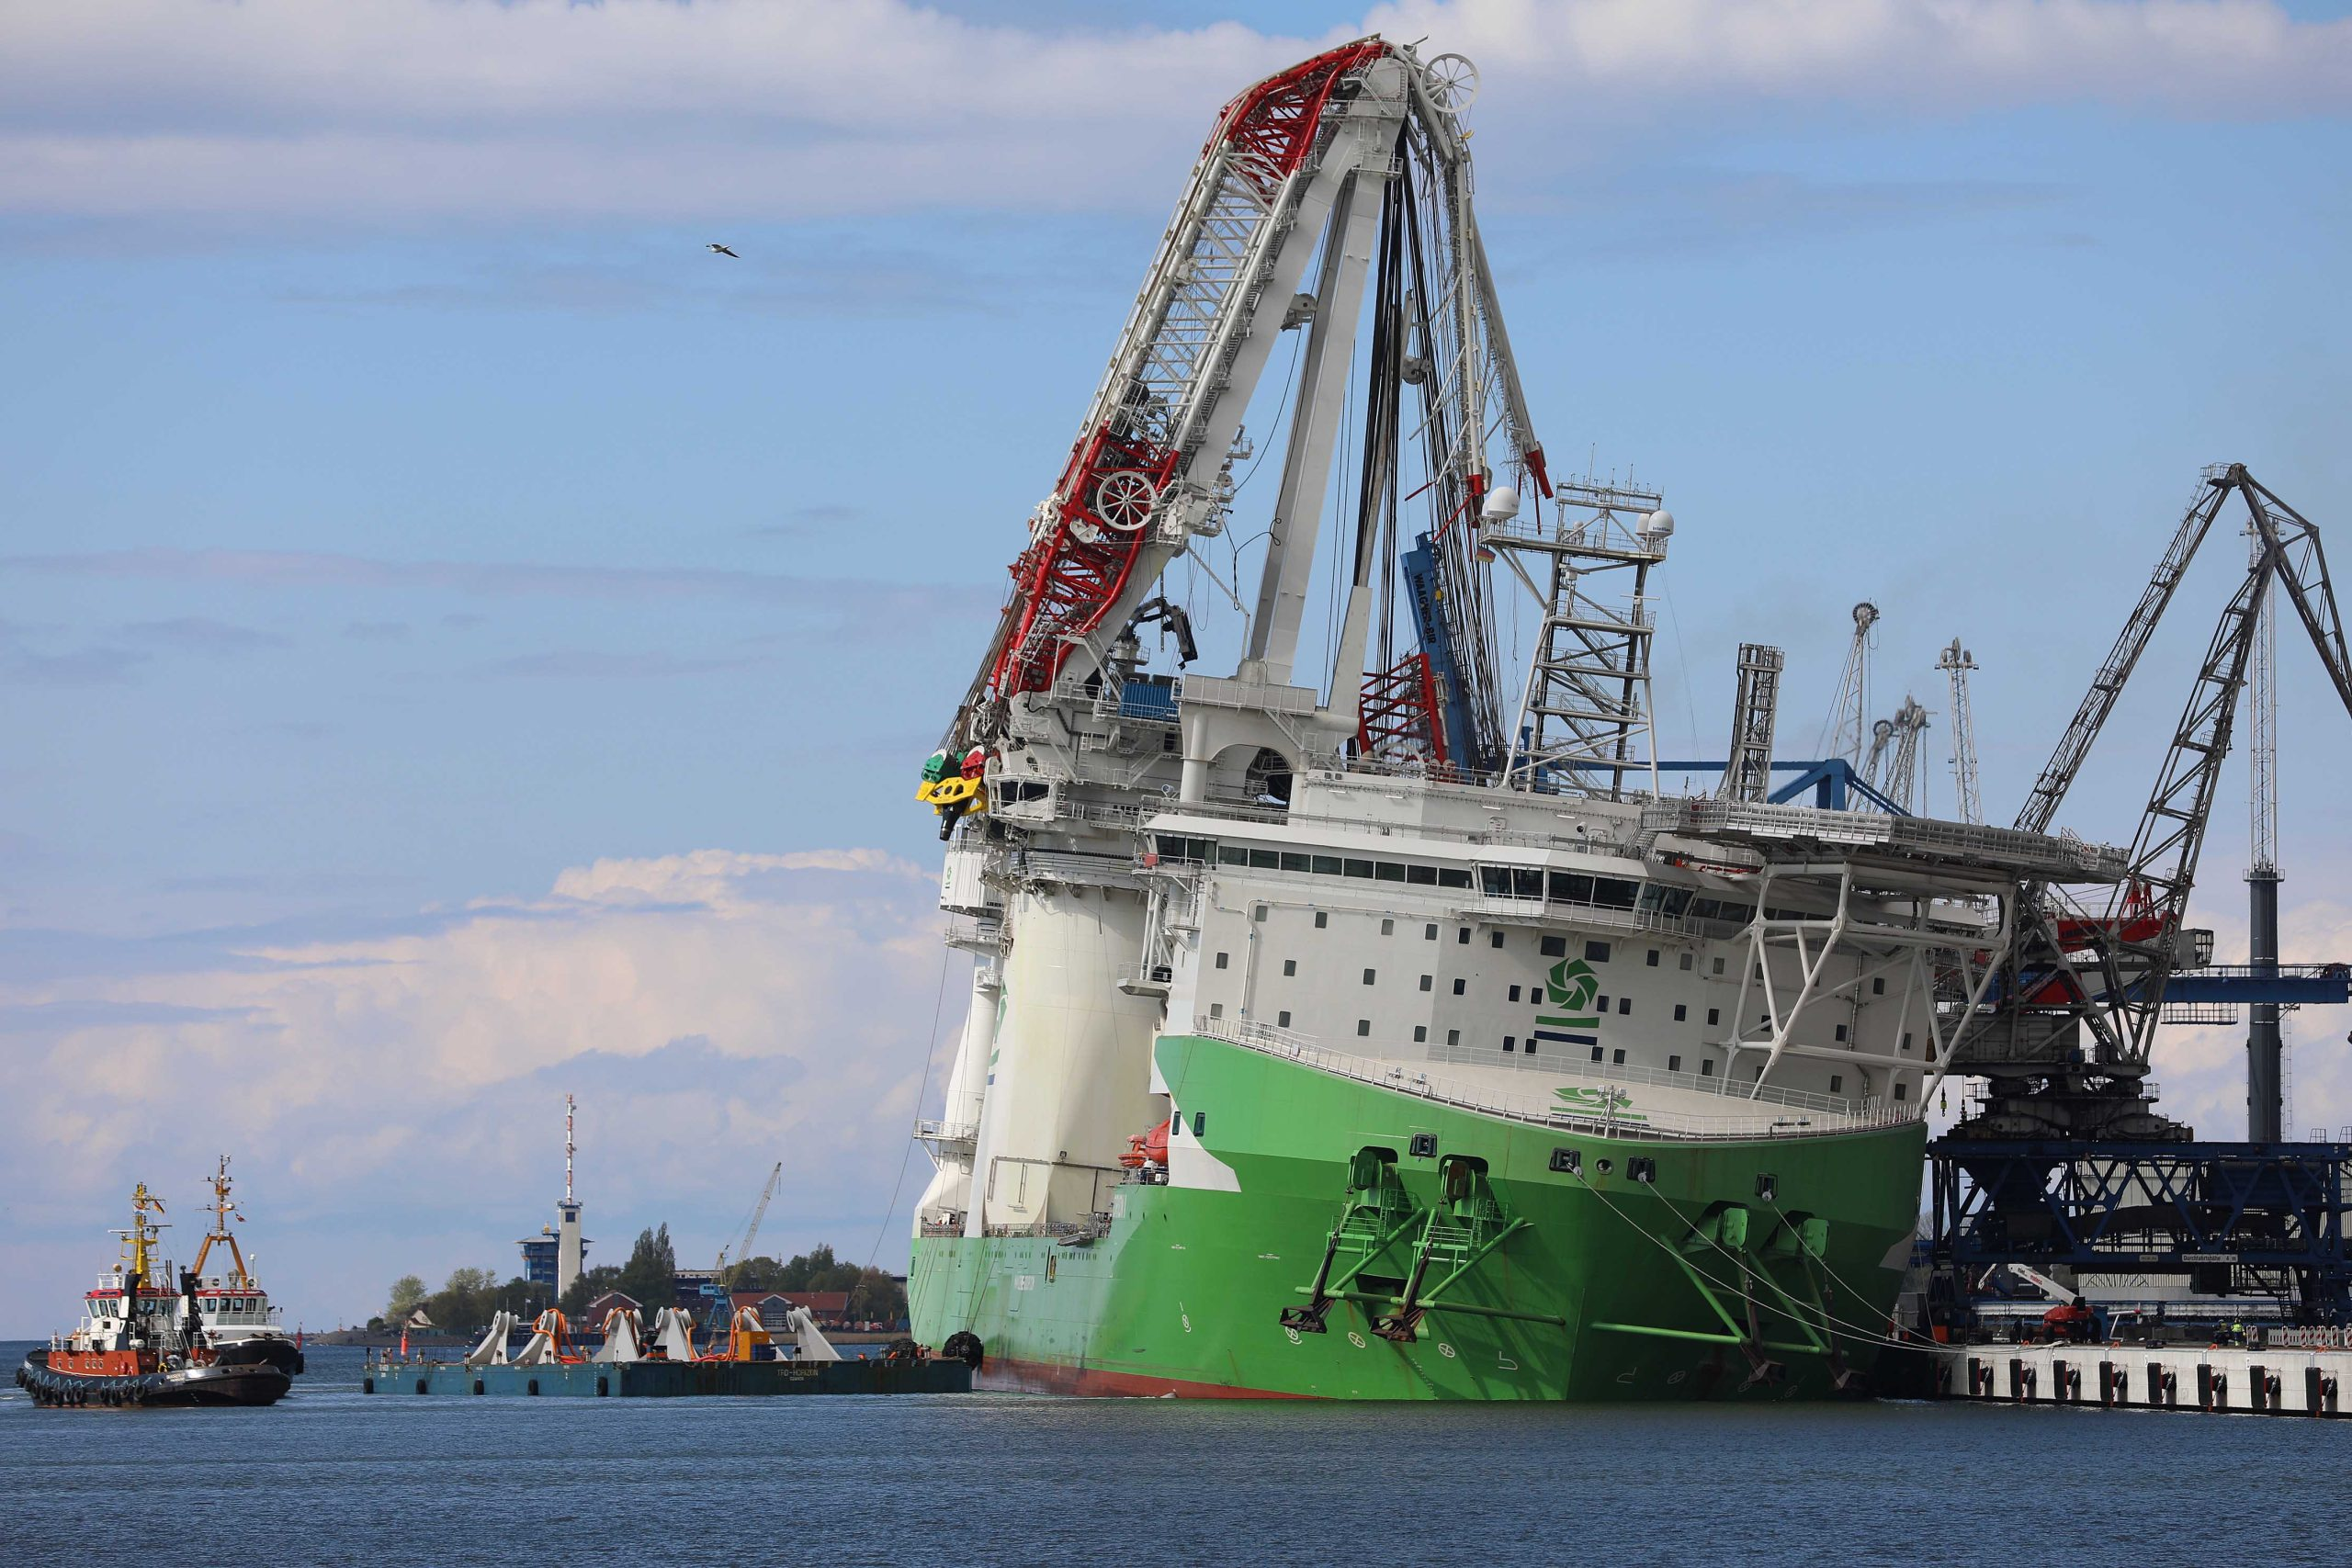 Orion Rostock